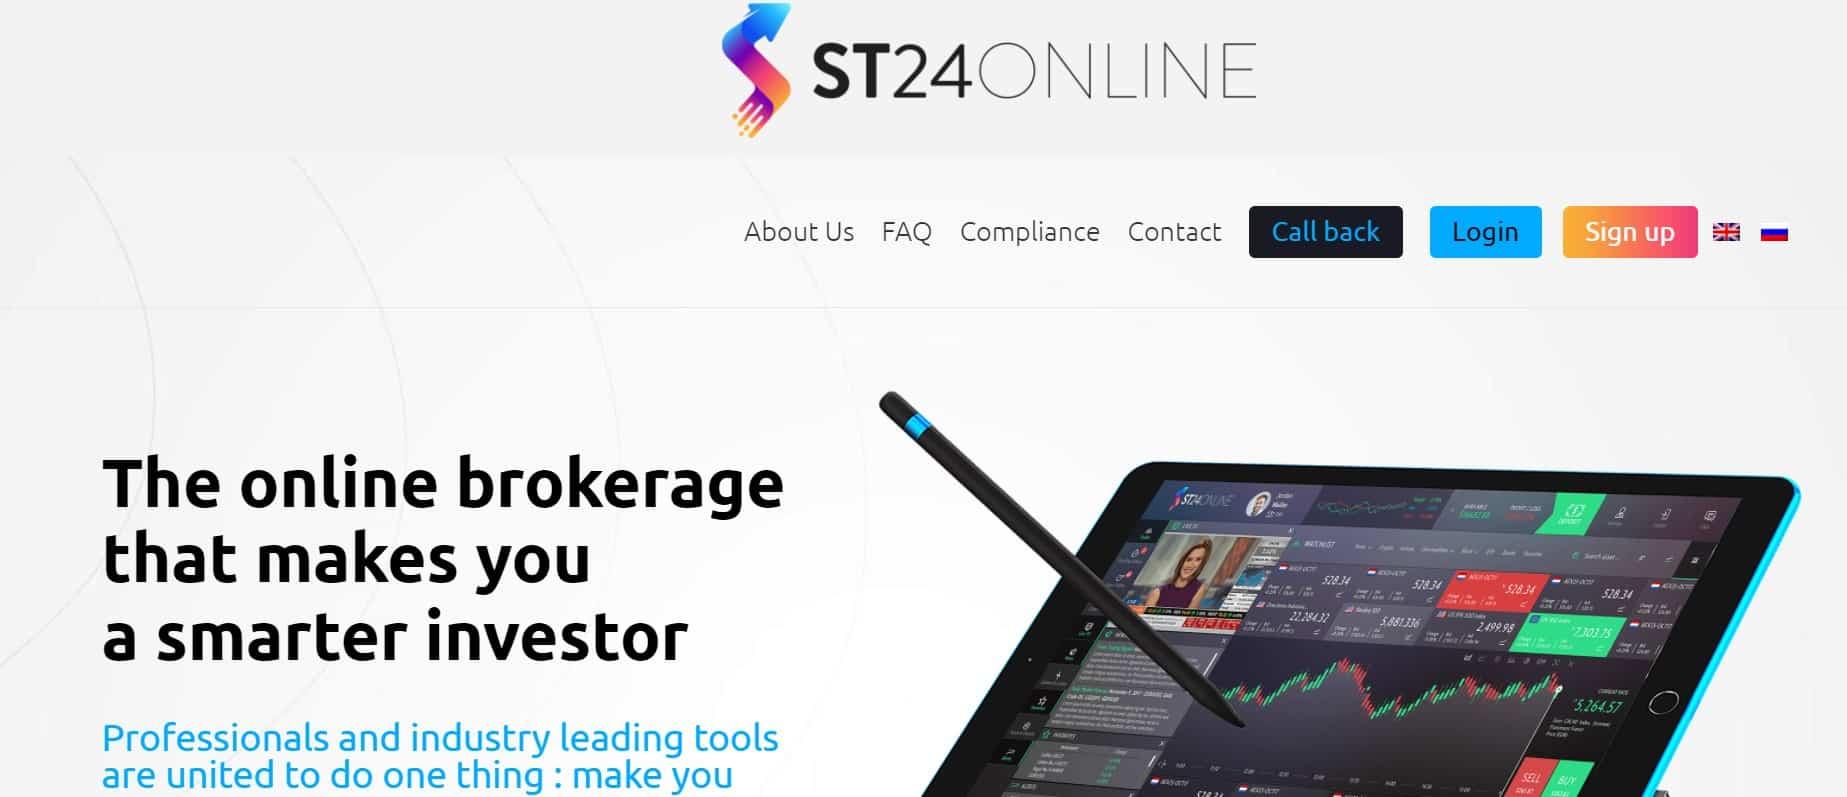 St24online website